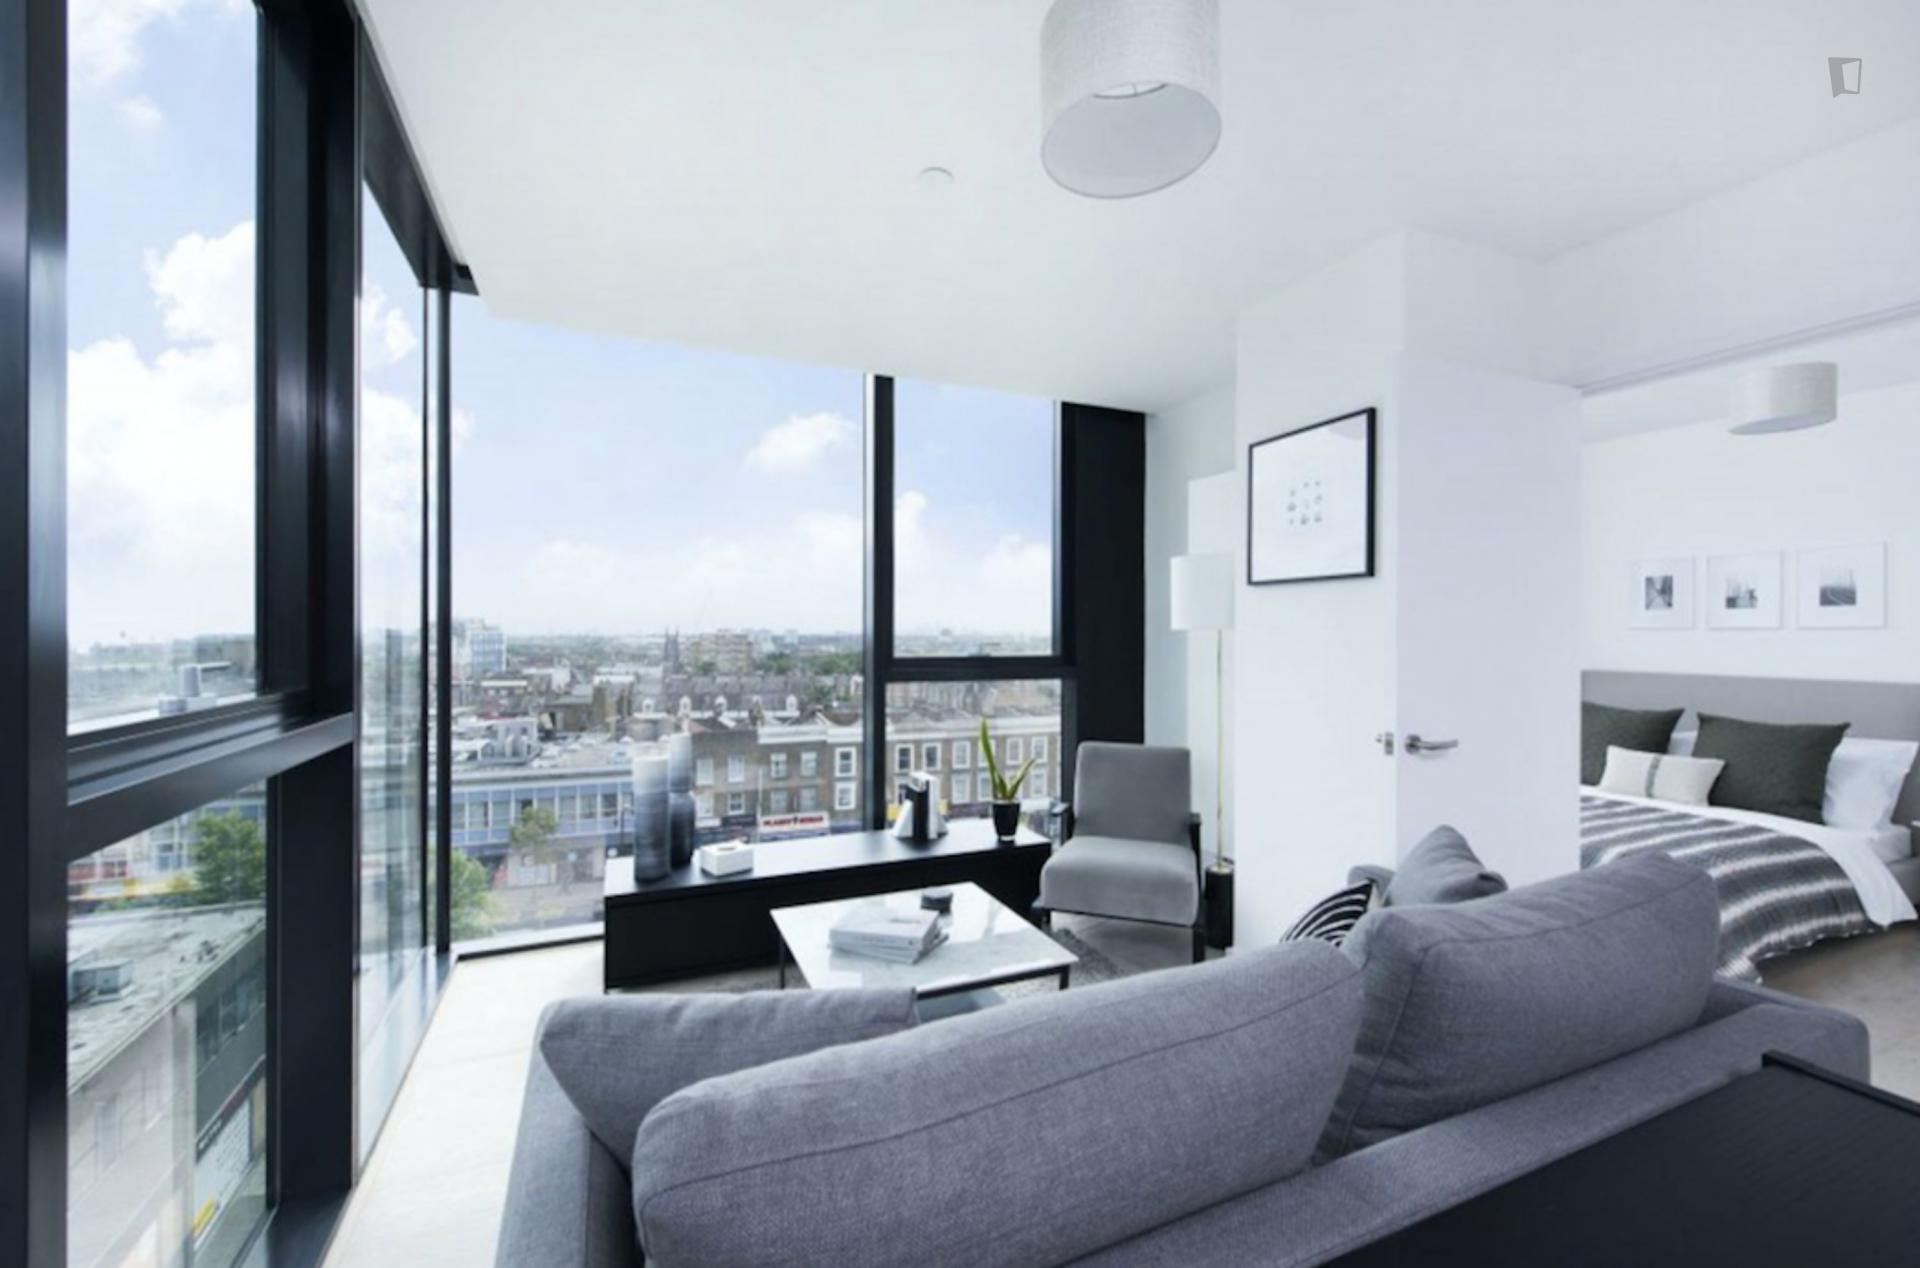 Archway - Stunning studio in London